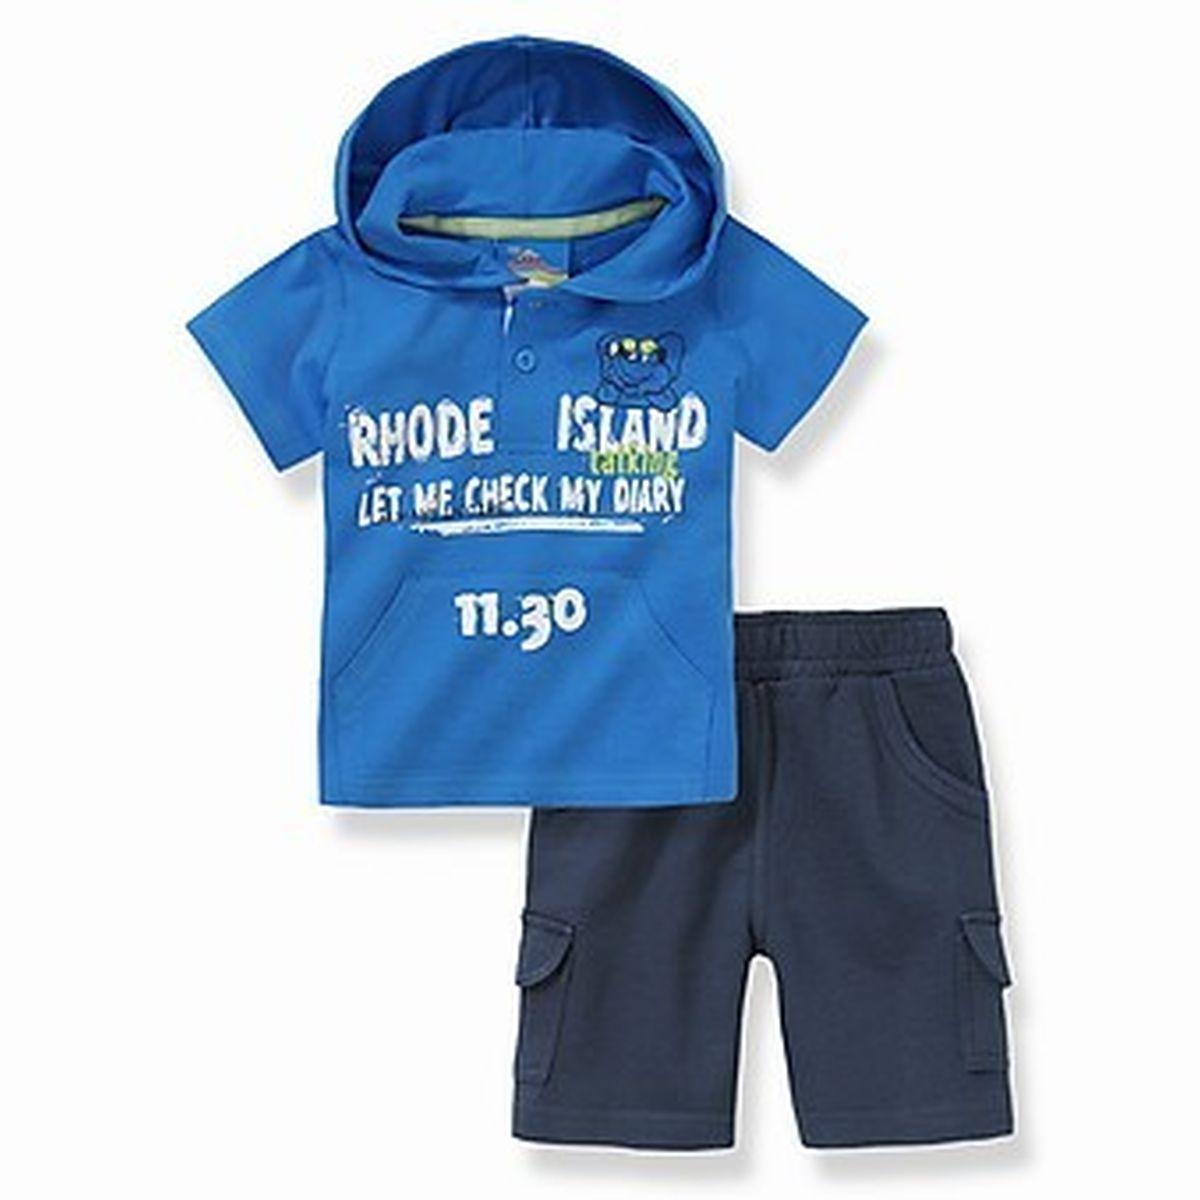 Topolino детская одежда интернет